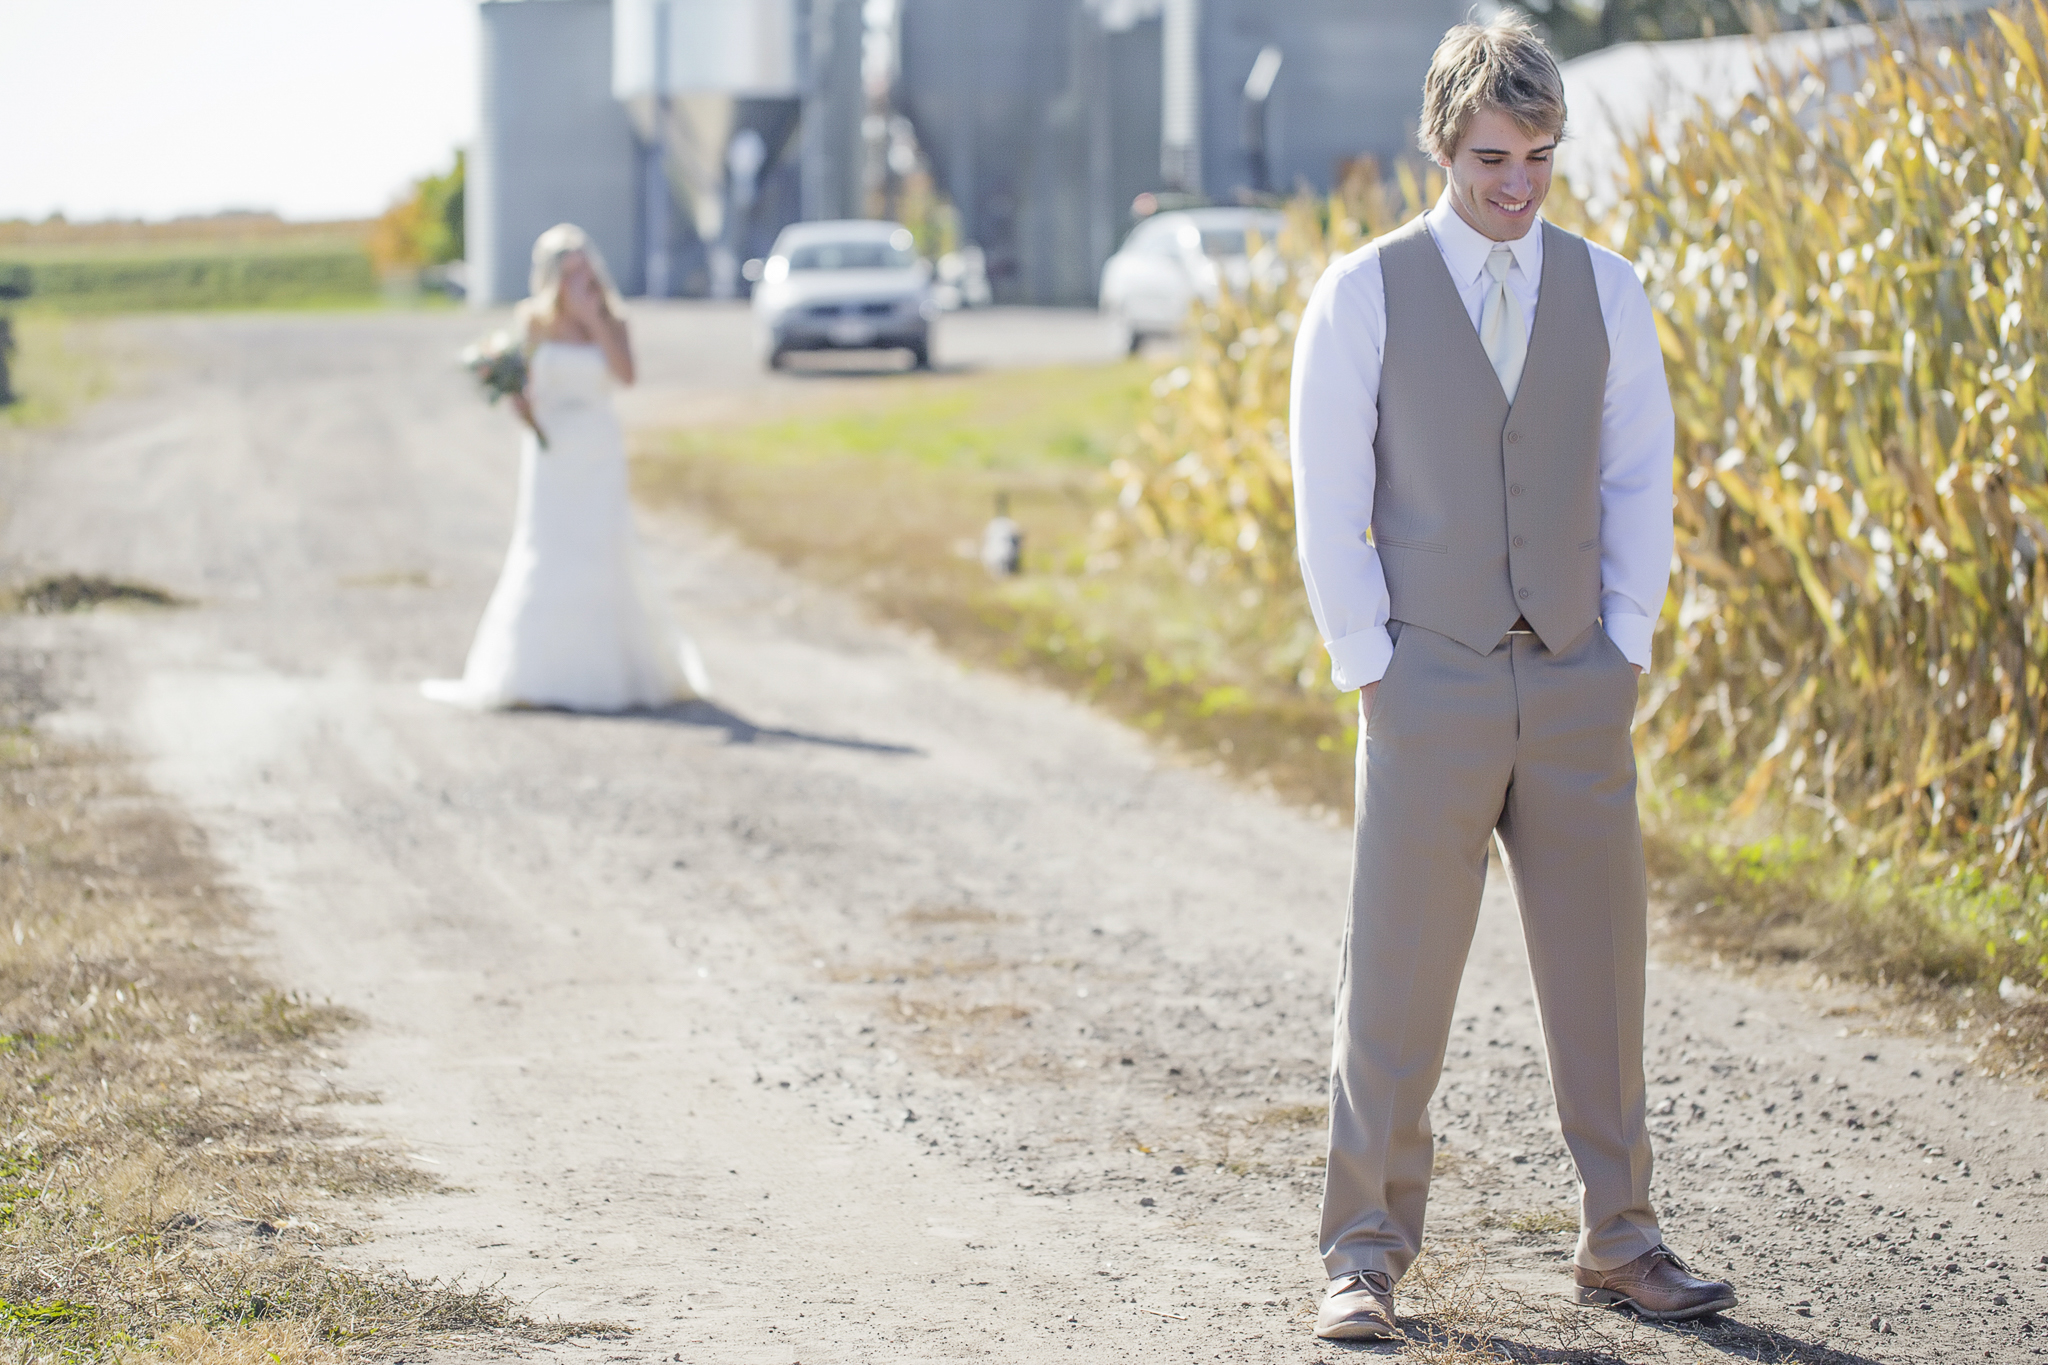 family farm minnesota wedding photography-6.jpg